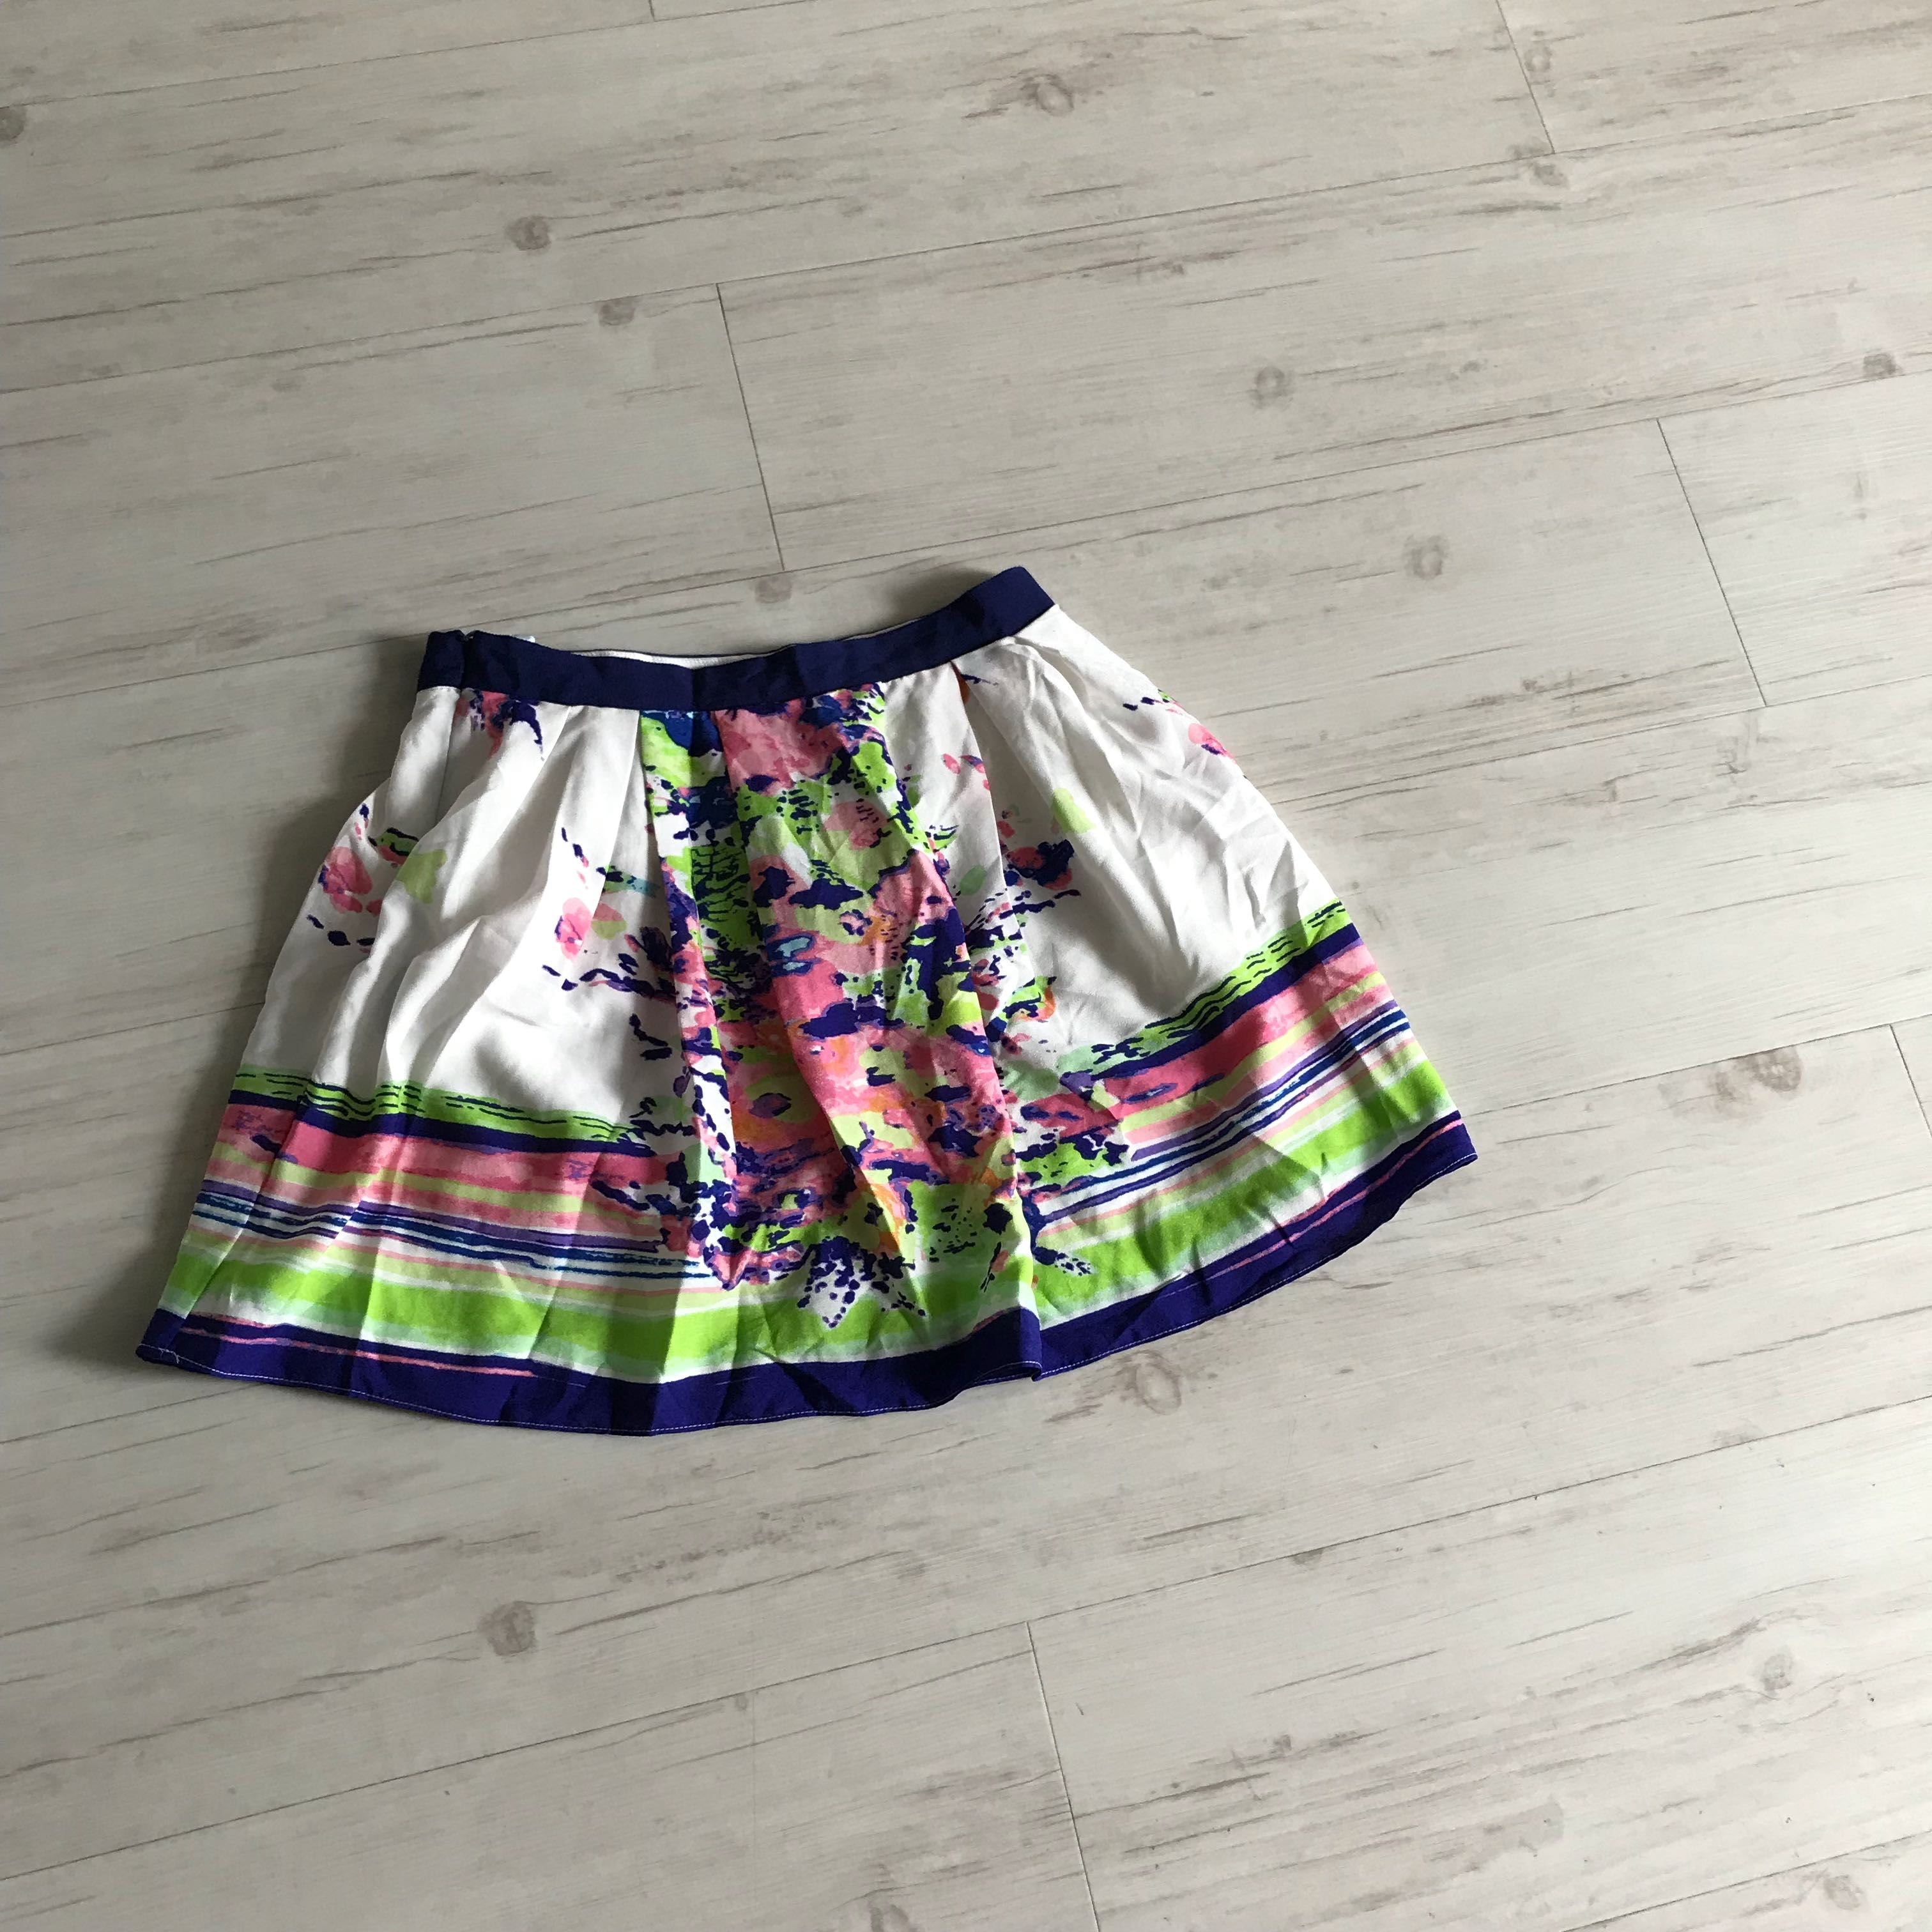 fb5329f2c4 Floral print short skirt, Women's Fashion, Clothes, Dresses & Skirts ...